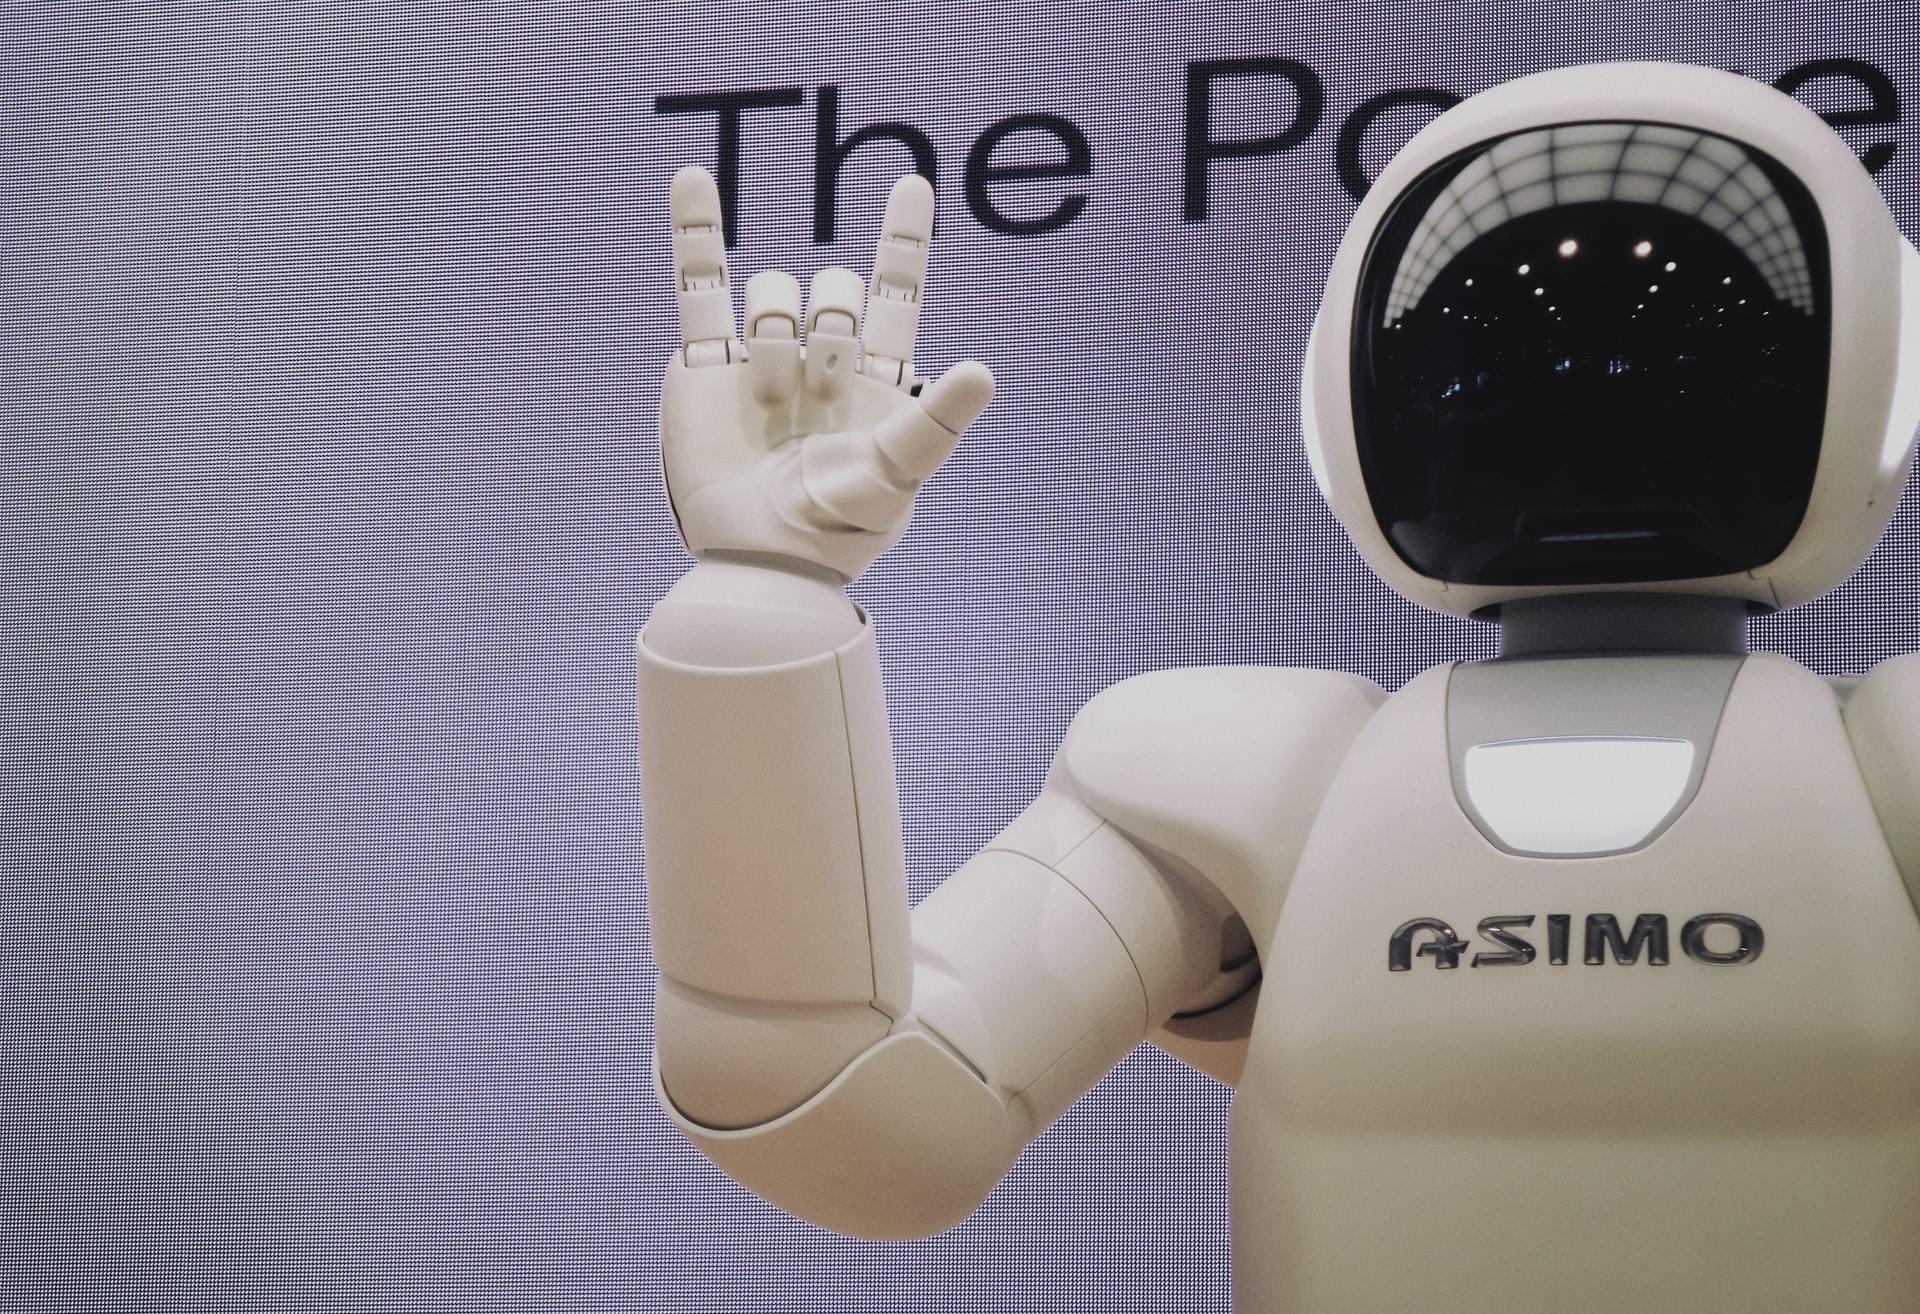 A robot gives a handsign. Unsplash/Possessed Photography